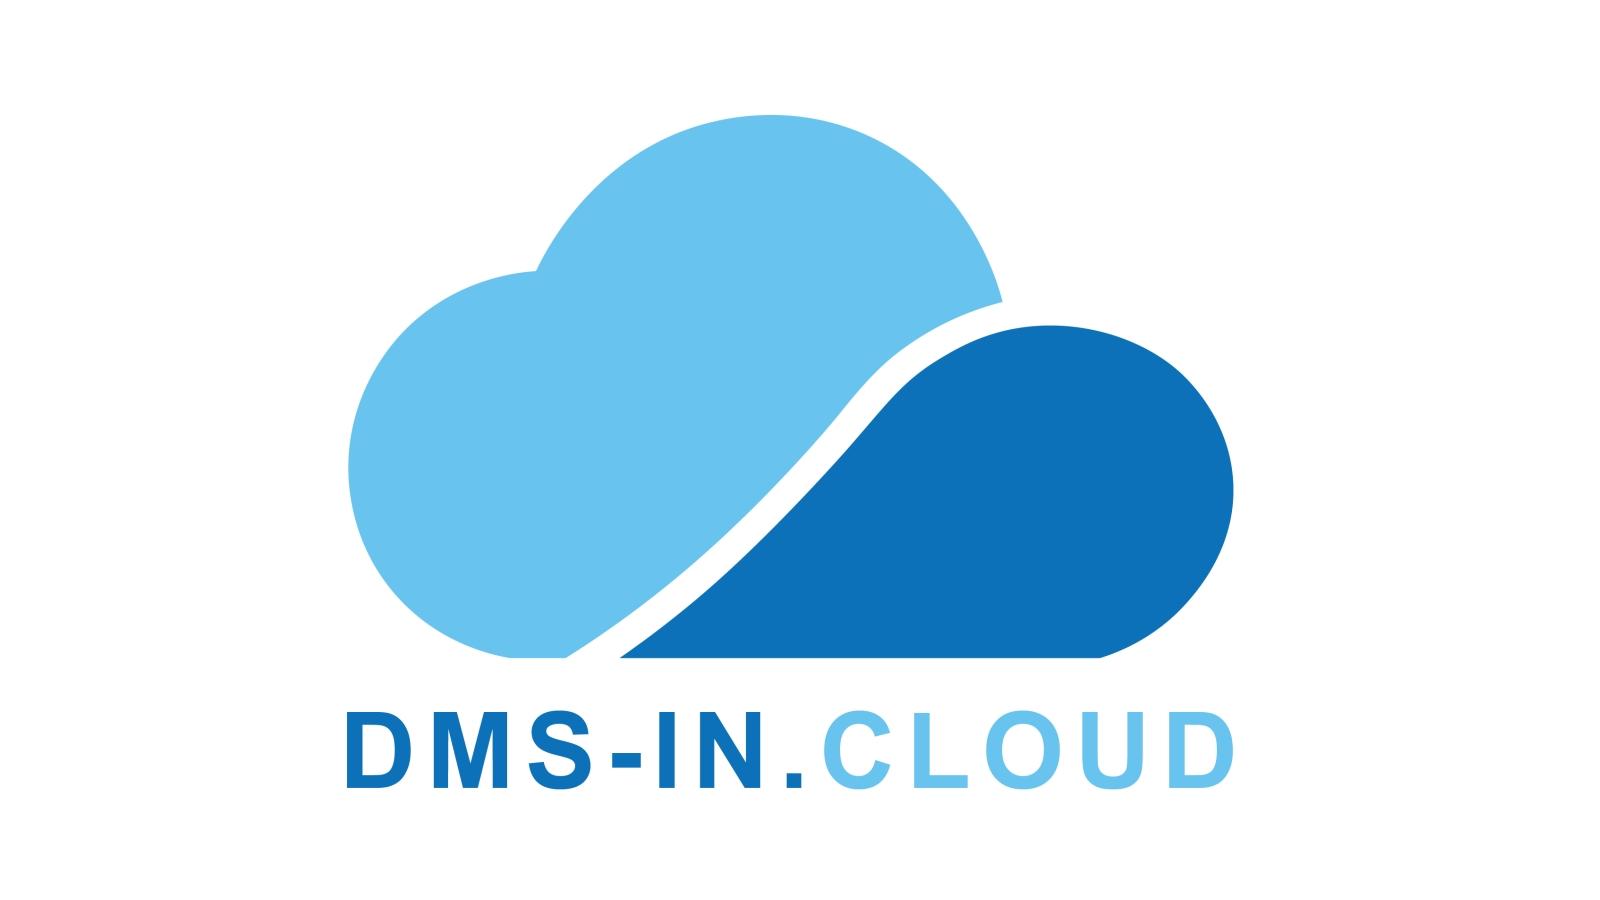 Logo DMS-IN.CLOUD Barevné 2